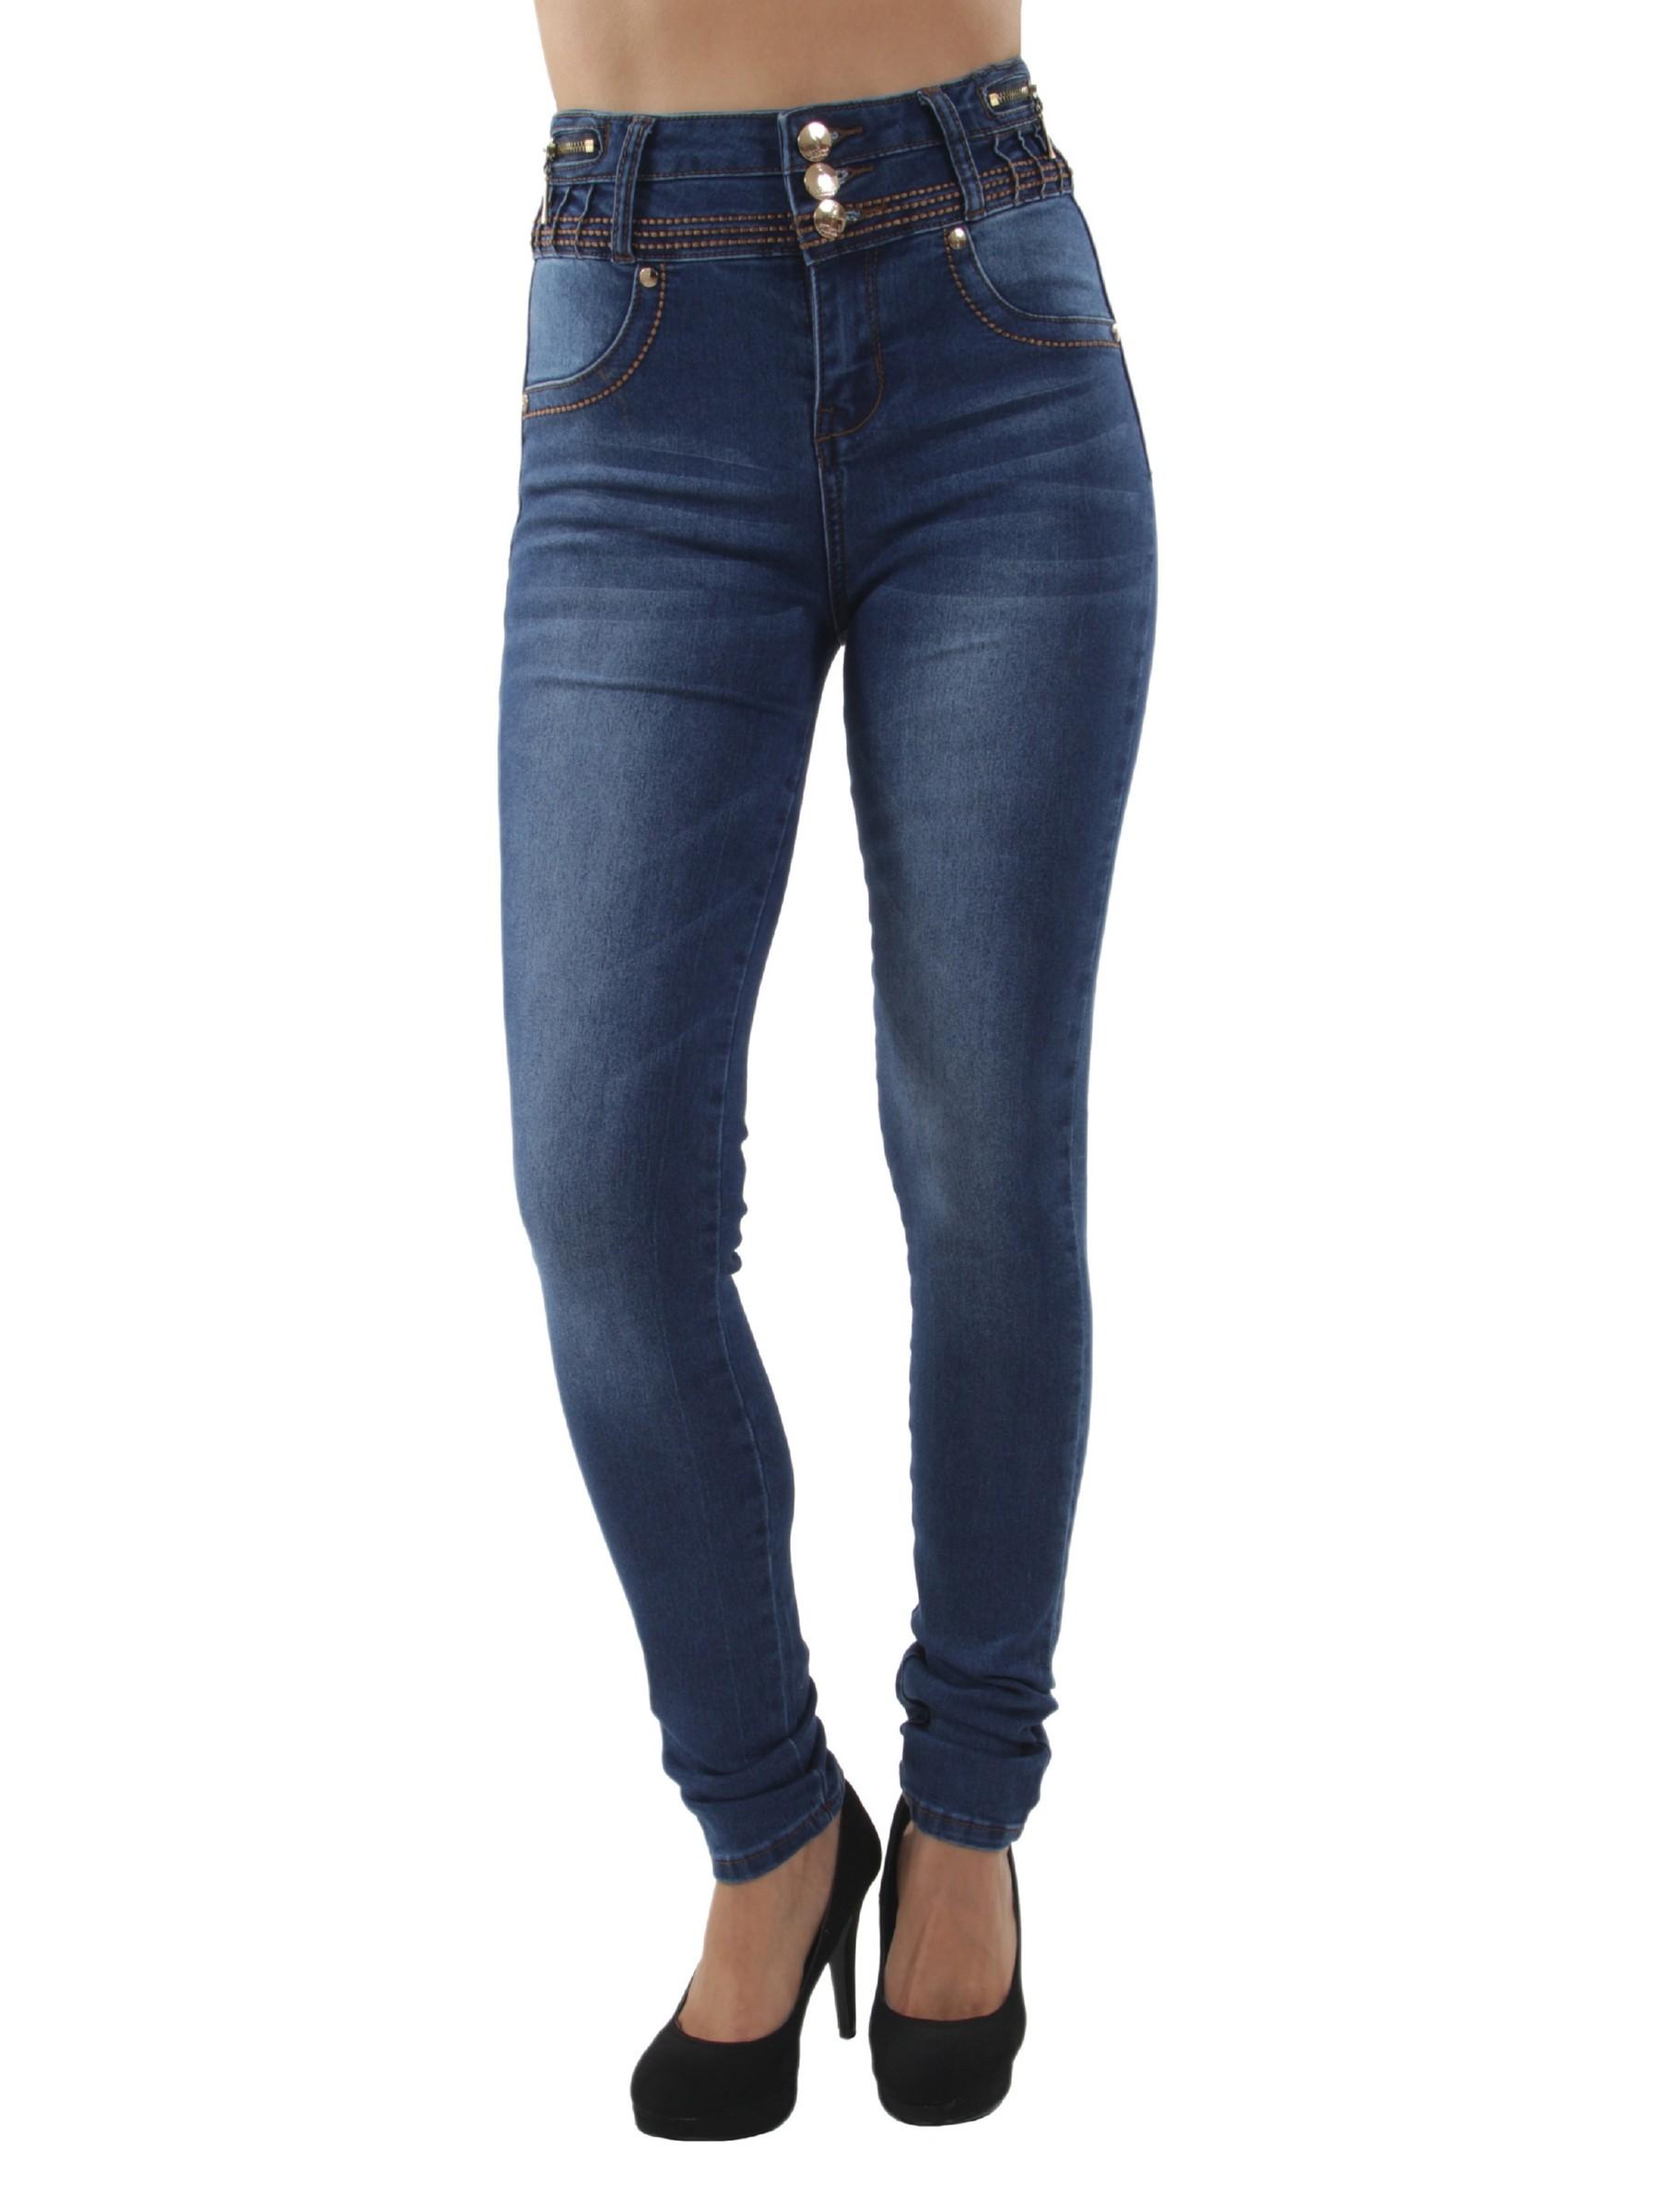 Colombian Design, Butt Lift, Push Up, High Waist, Skinny Jeans